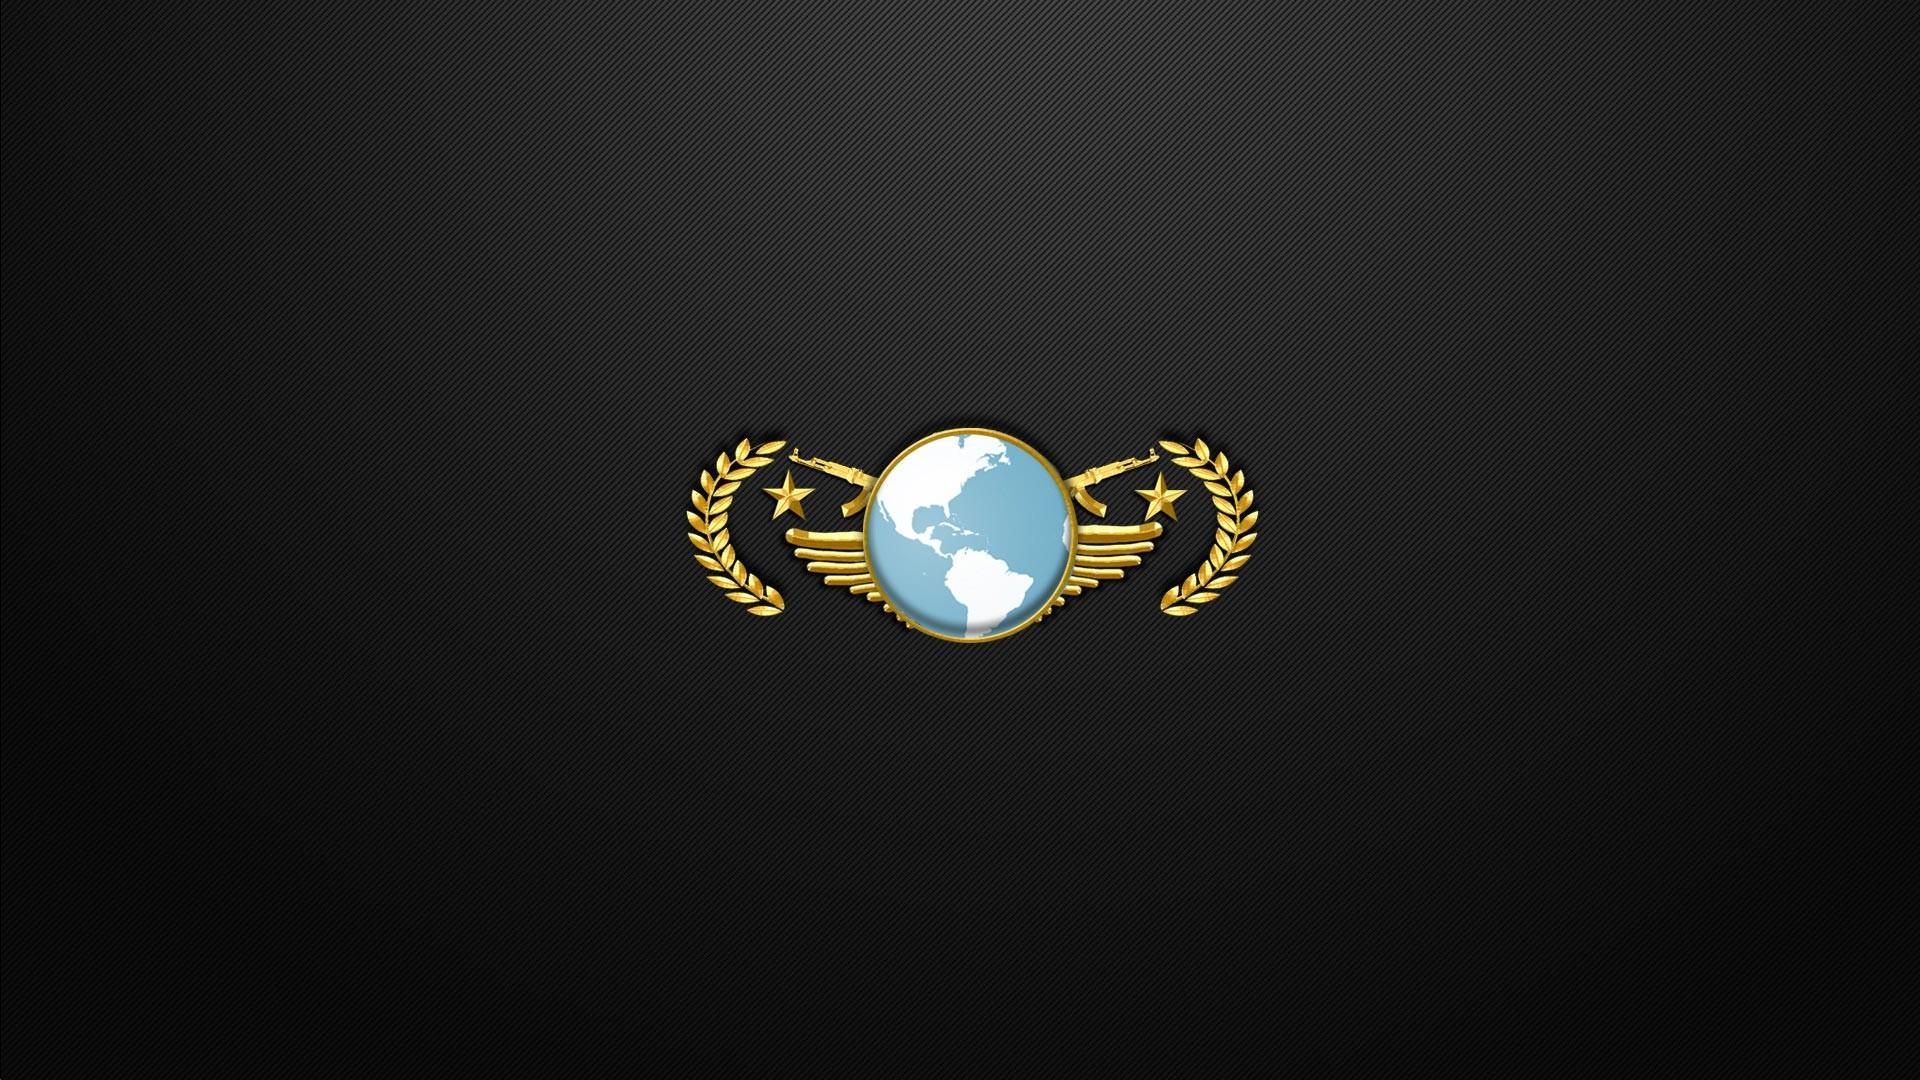 cs-go-rank-global-elite